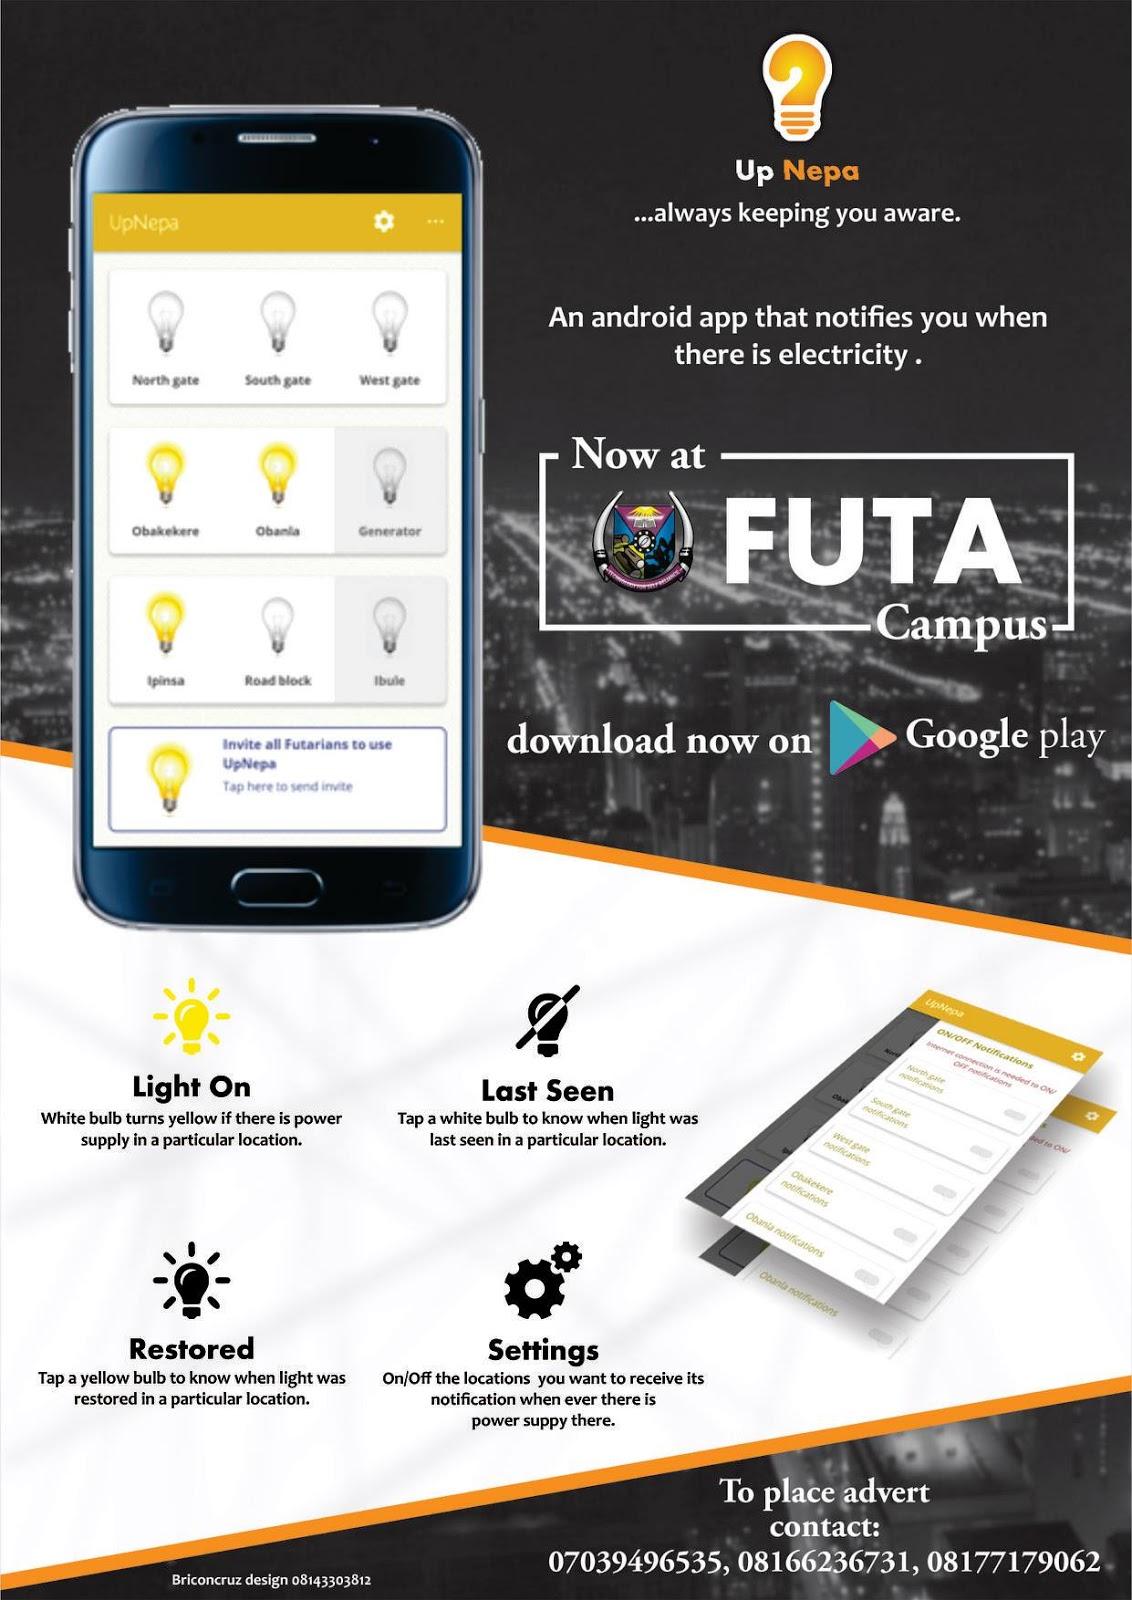 FUTA Students Develop Electricity Notification App